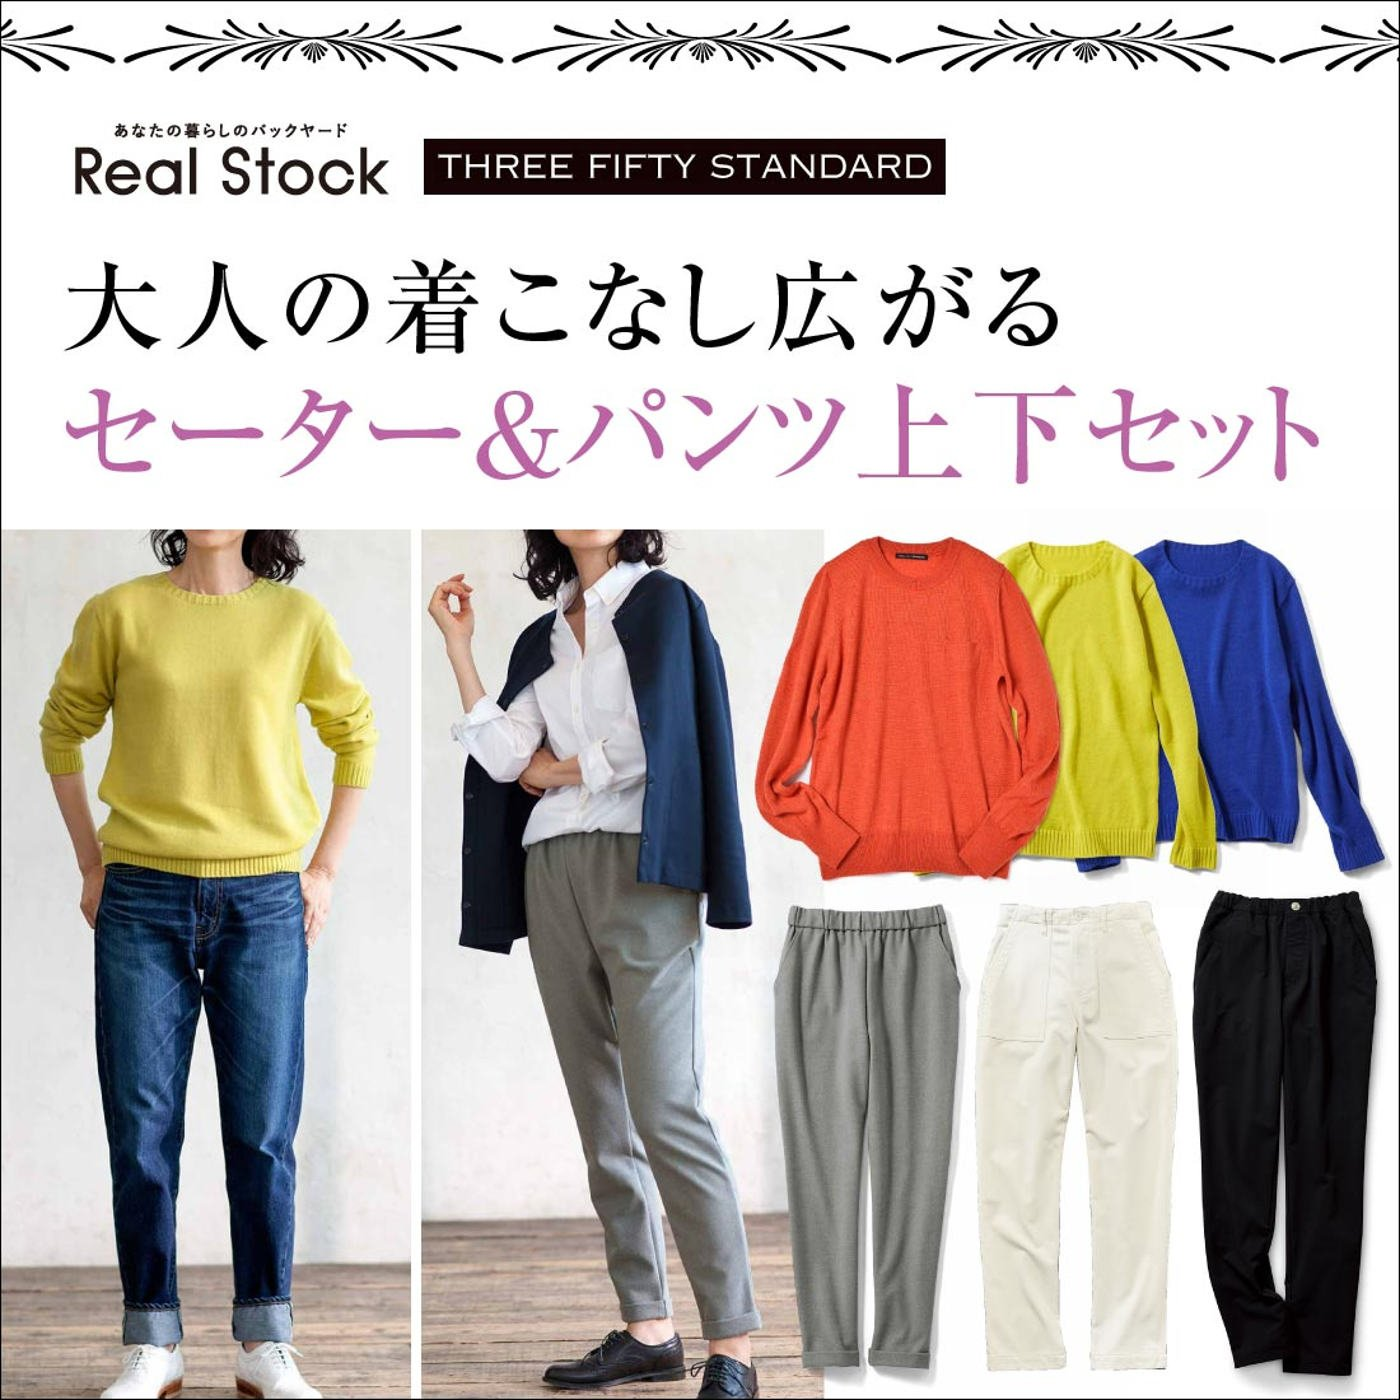 THREE FIFTY STANDARD 大人の着こなし広がる セーター&パンツ上下セット